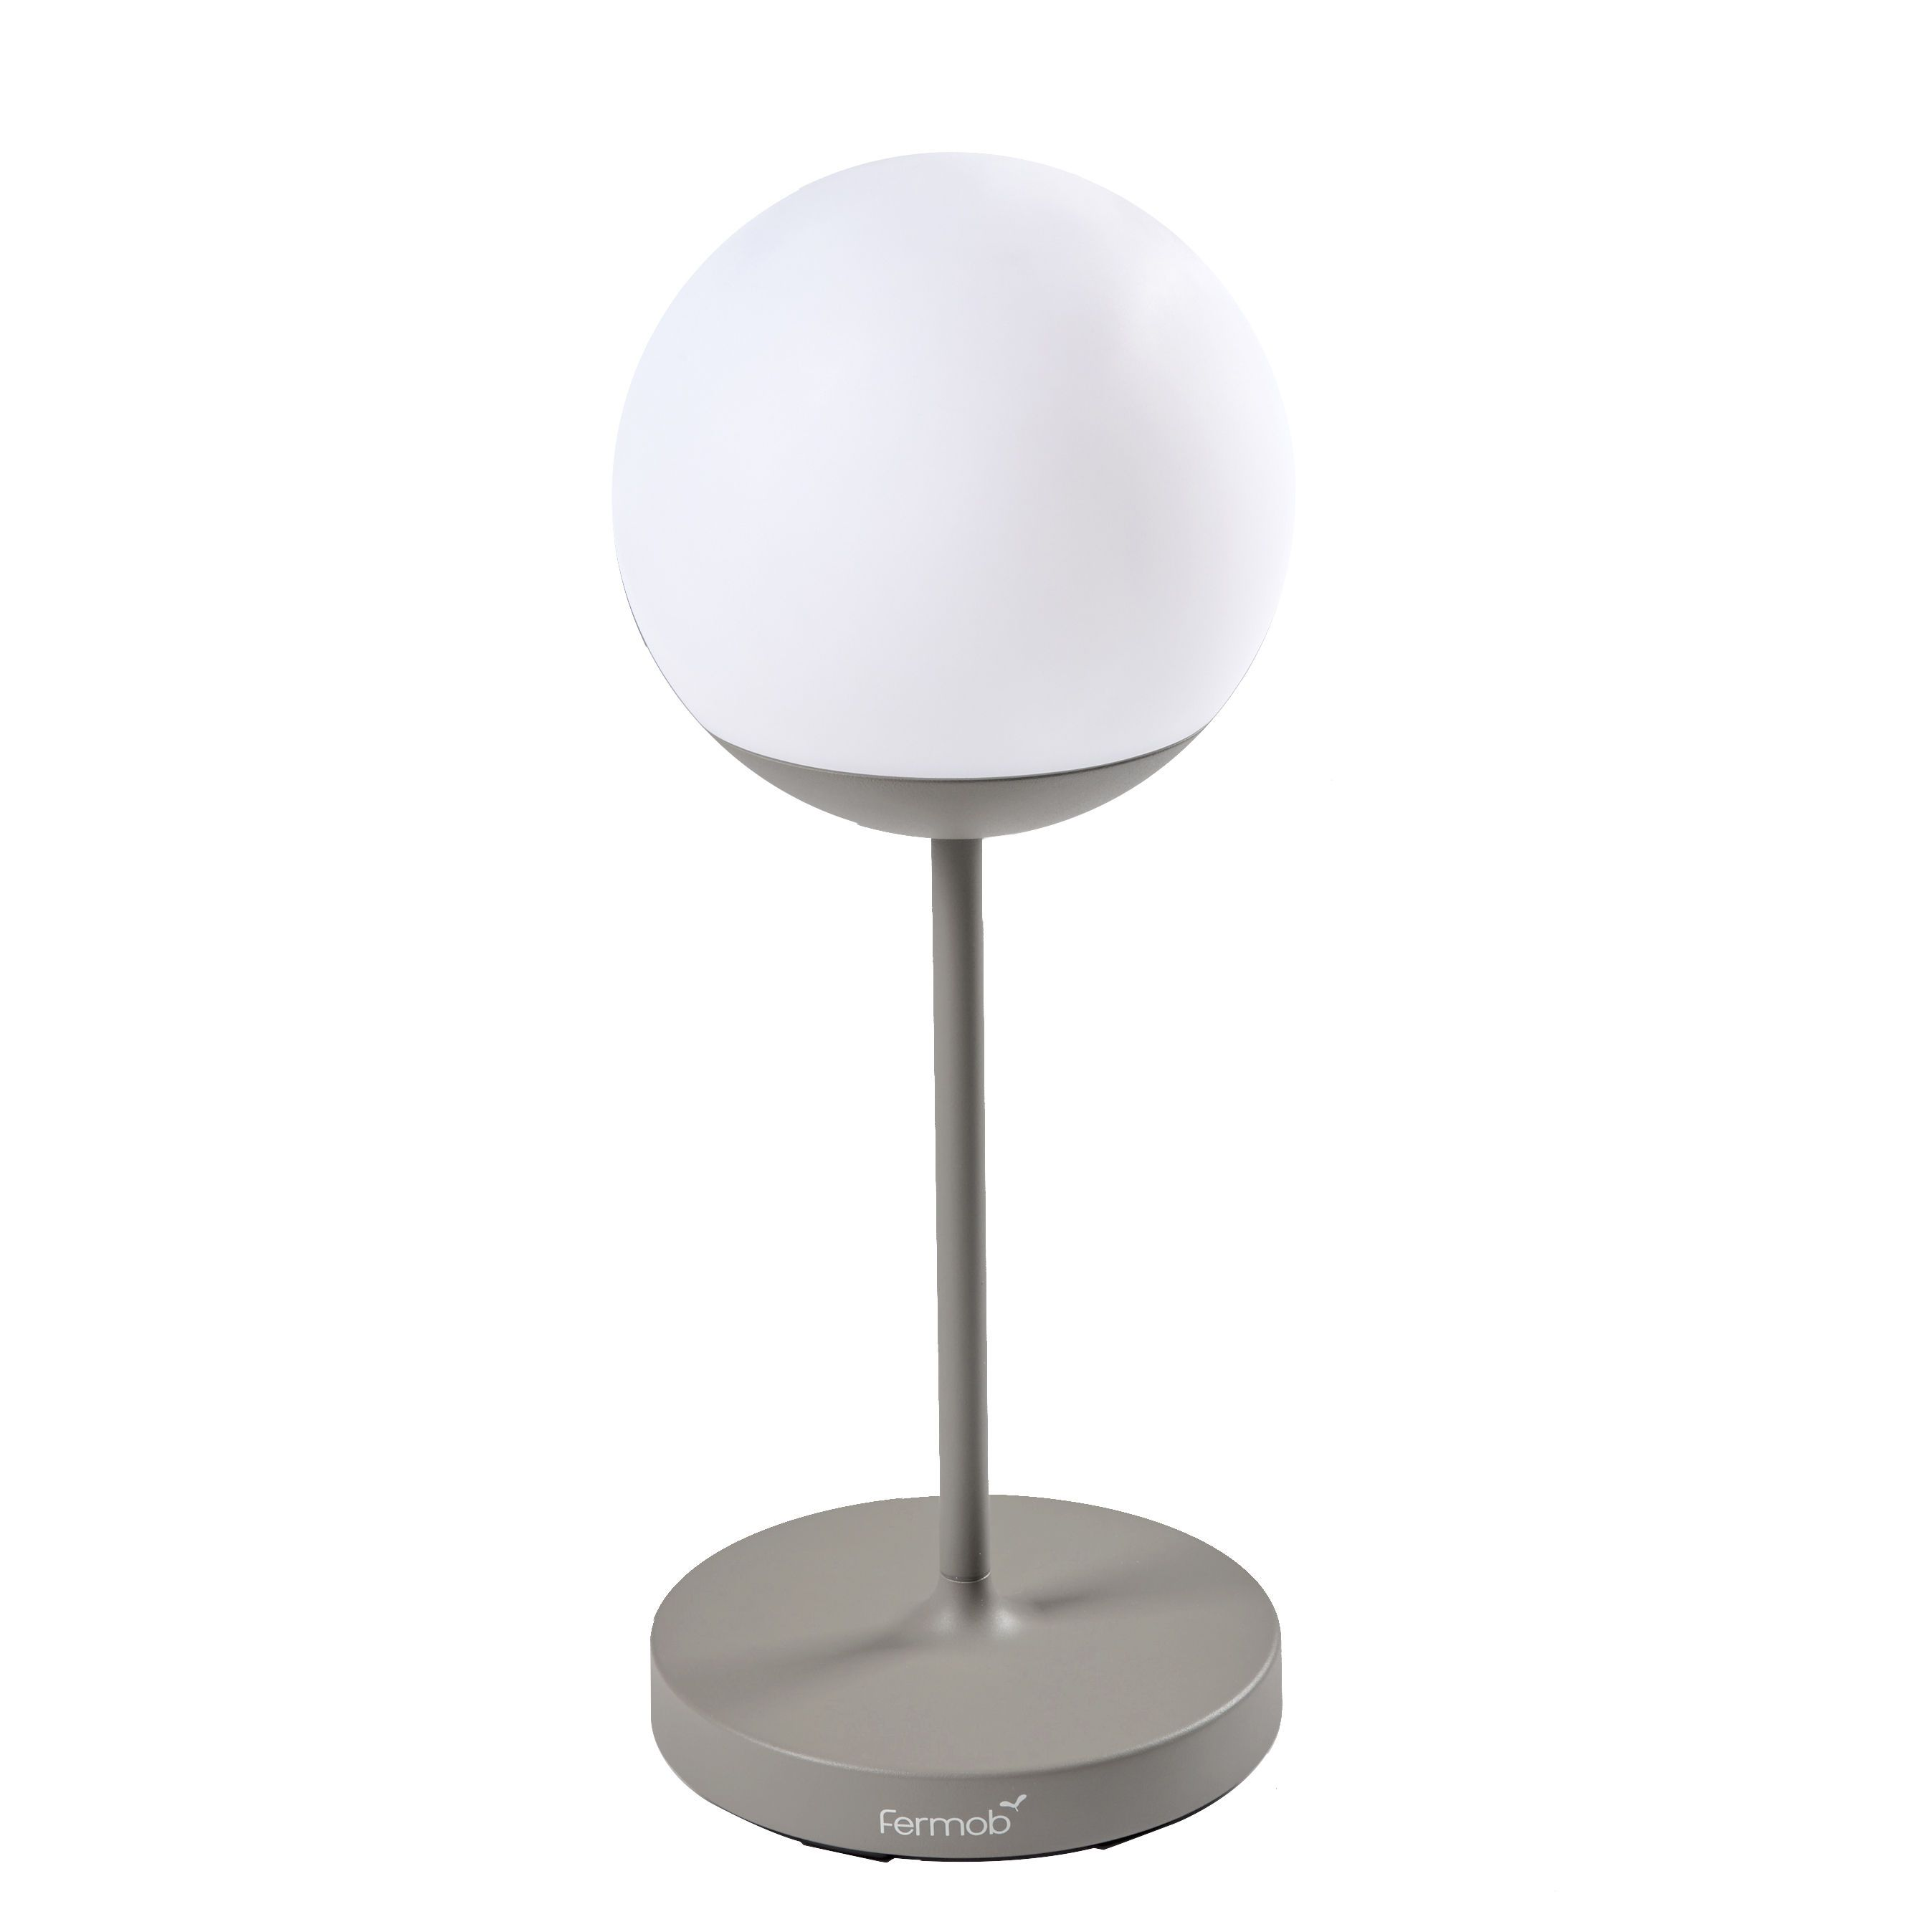 Mooon Led Lampe Ohne Kabel Mooon Von Fermob Beige Made In Design In 2020 Lampe Strassenlaterne Led Lampe